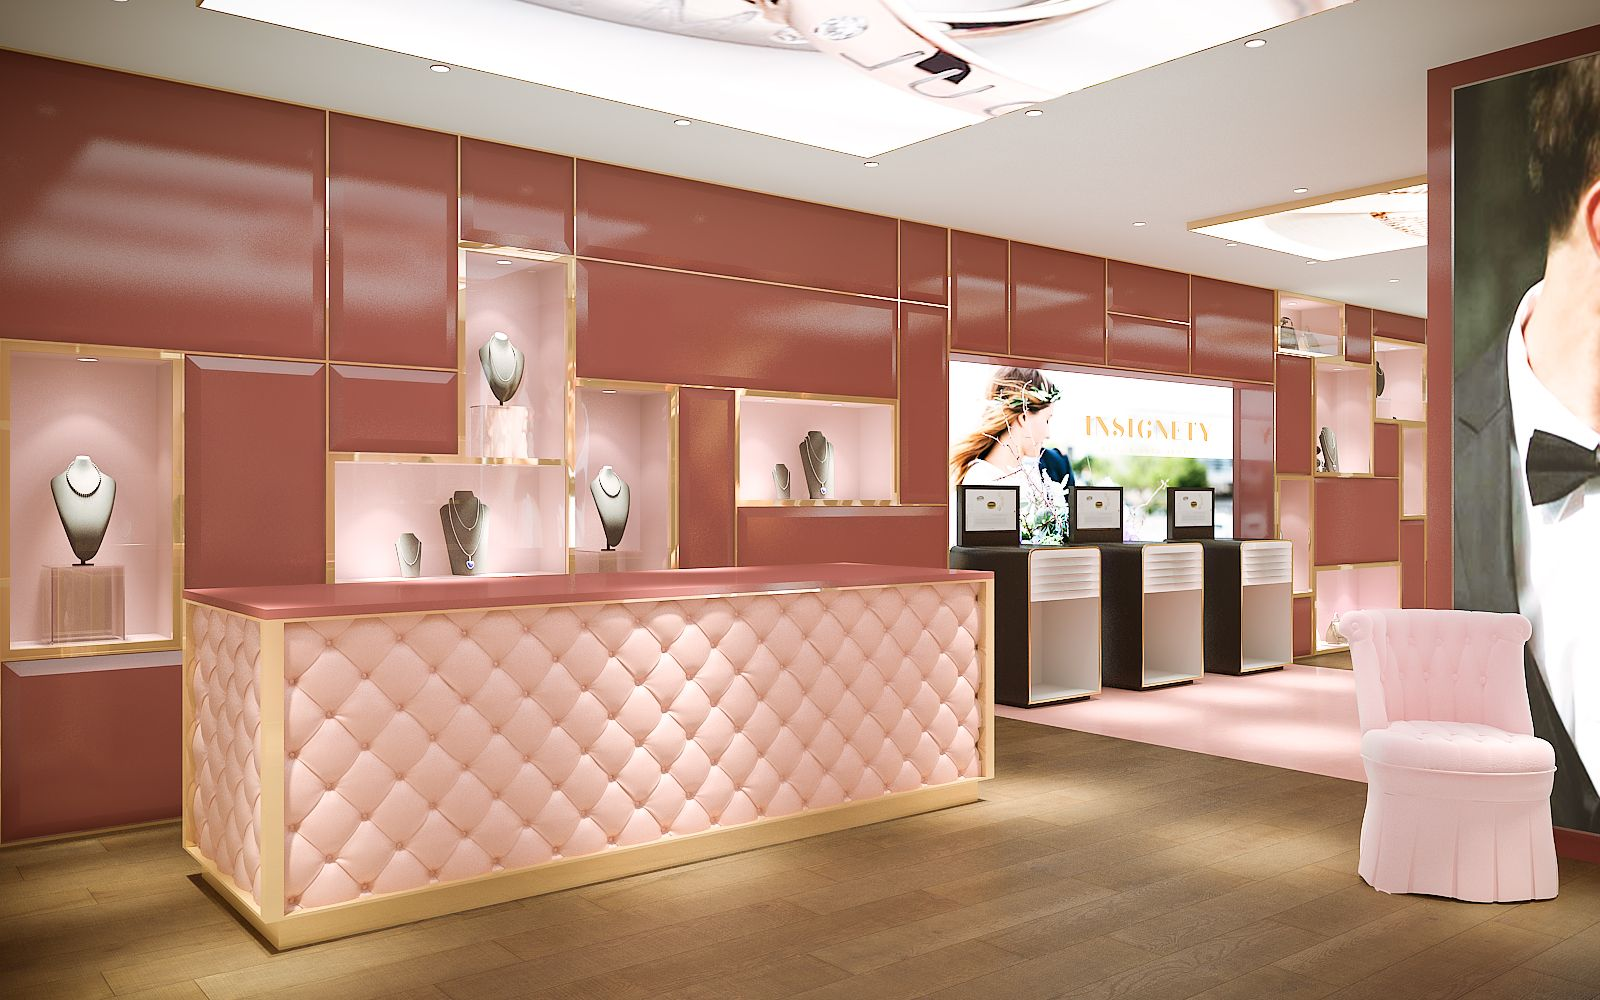 Jewelry Store - Amsterdam 544